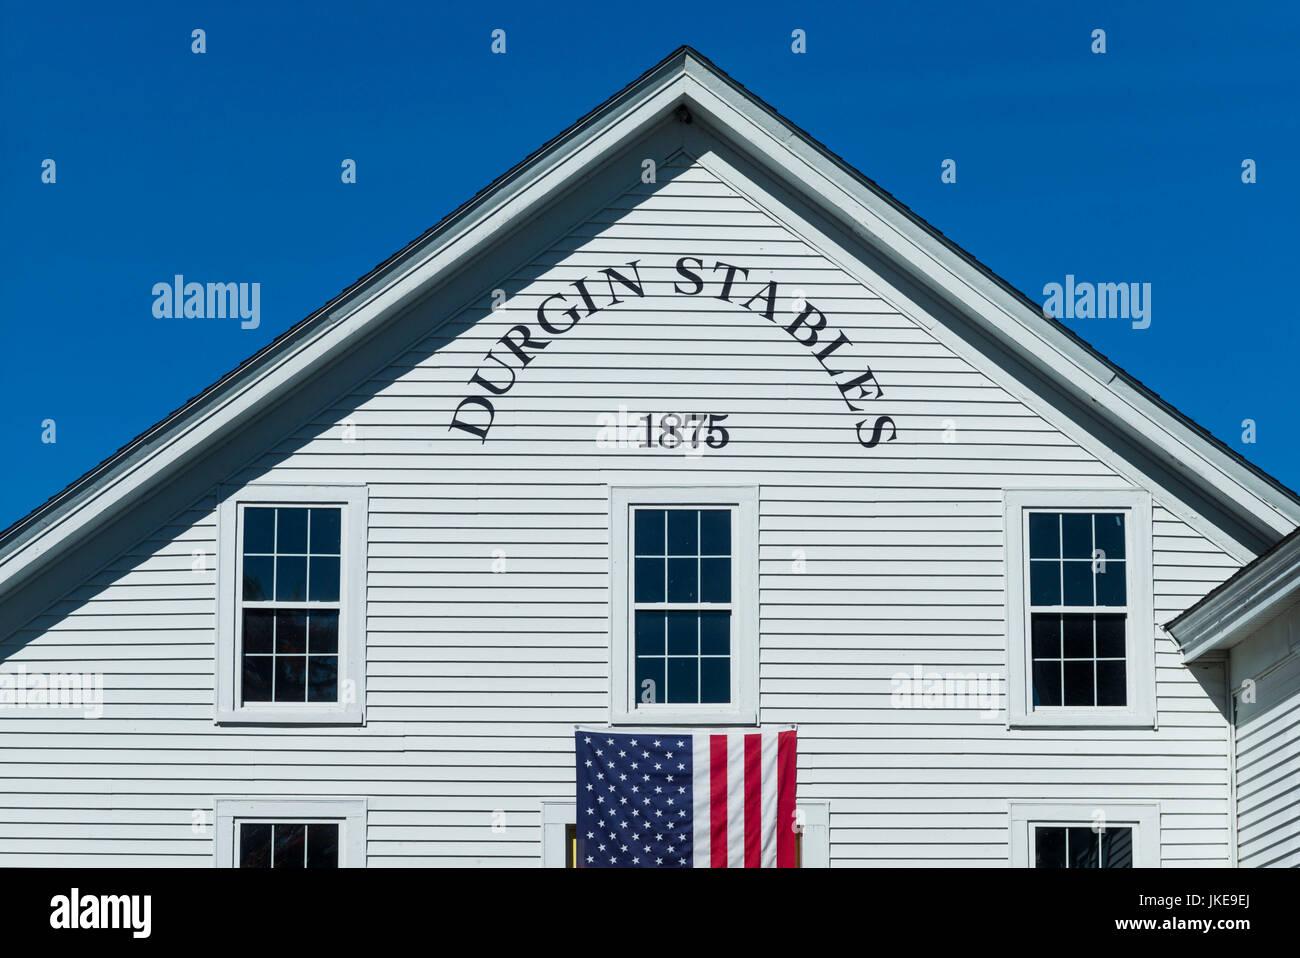 USA, New Hampshire, Lake Winnipesaukee Region, Wolfeboro, Durgin Stables building - Stock Image